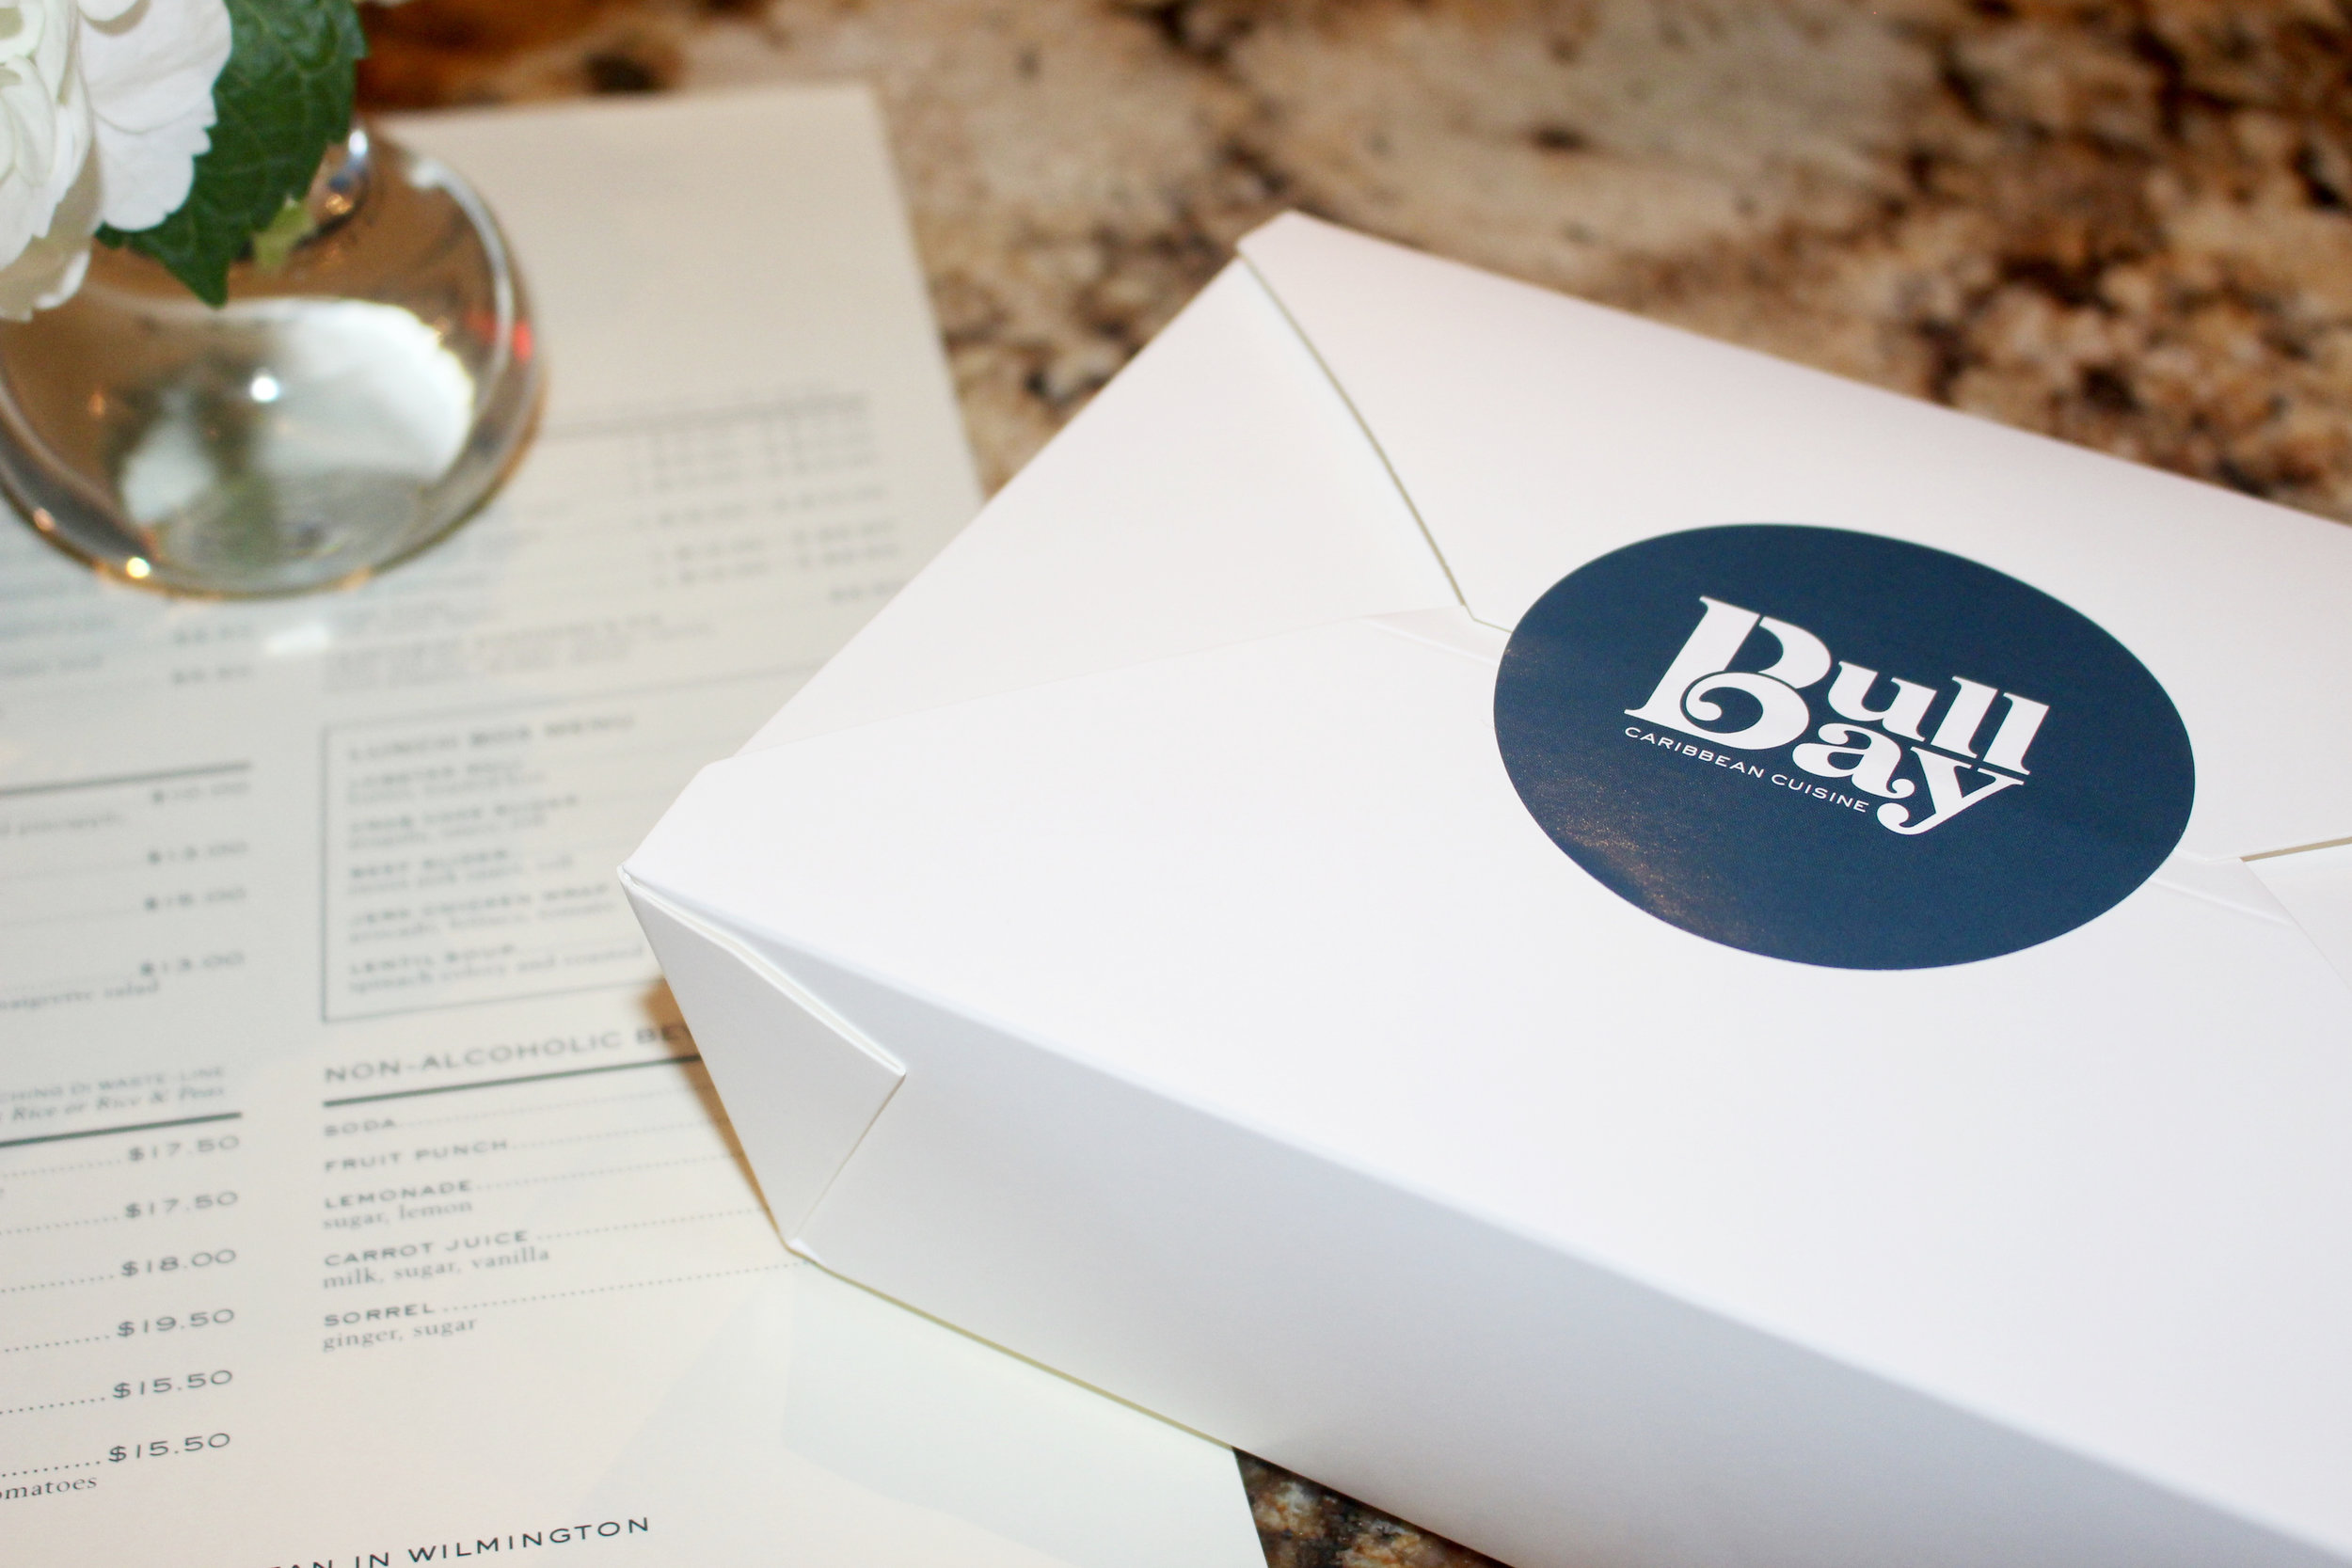 Bull Bay Lunch Box